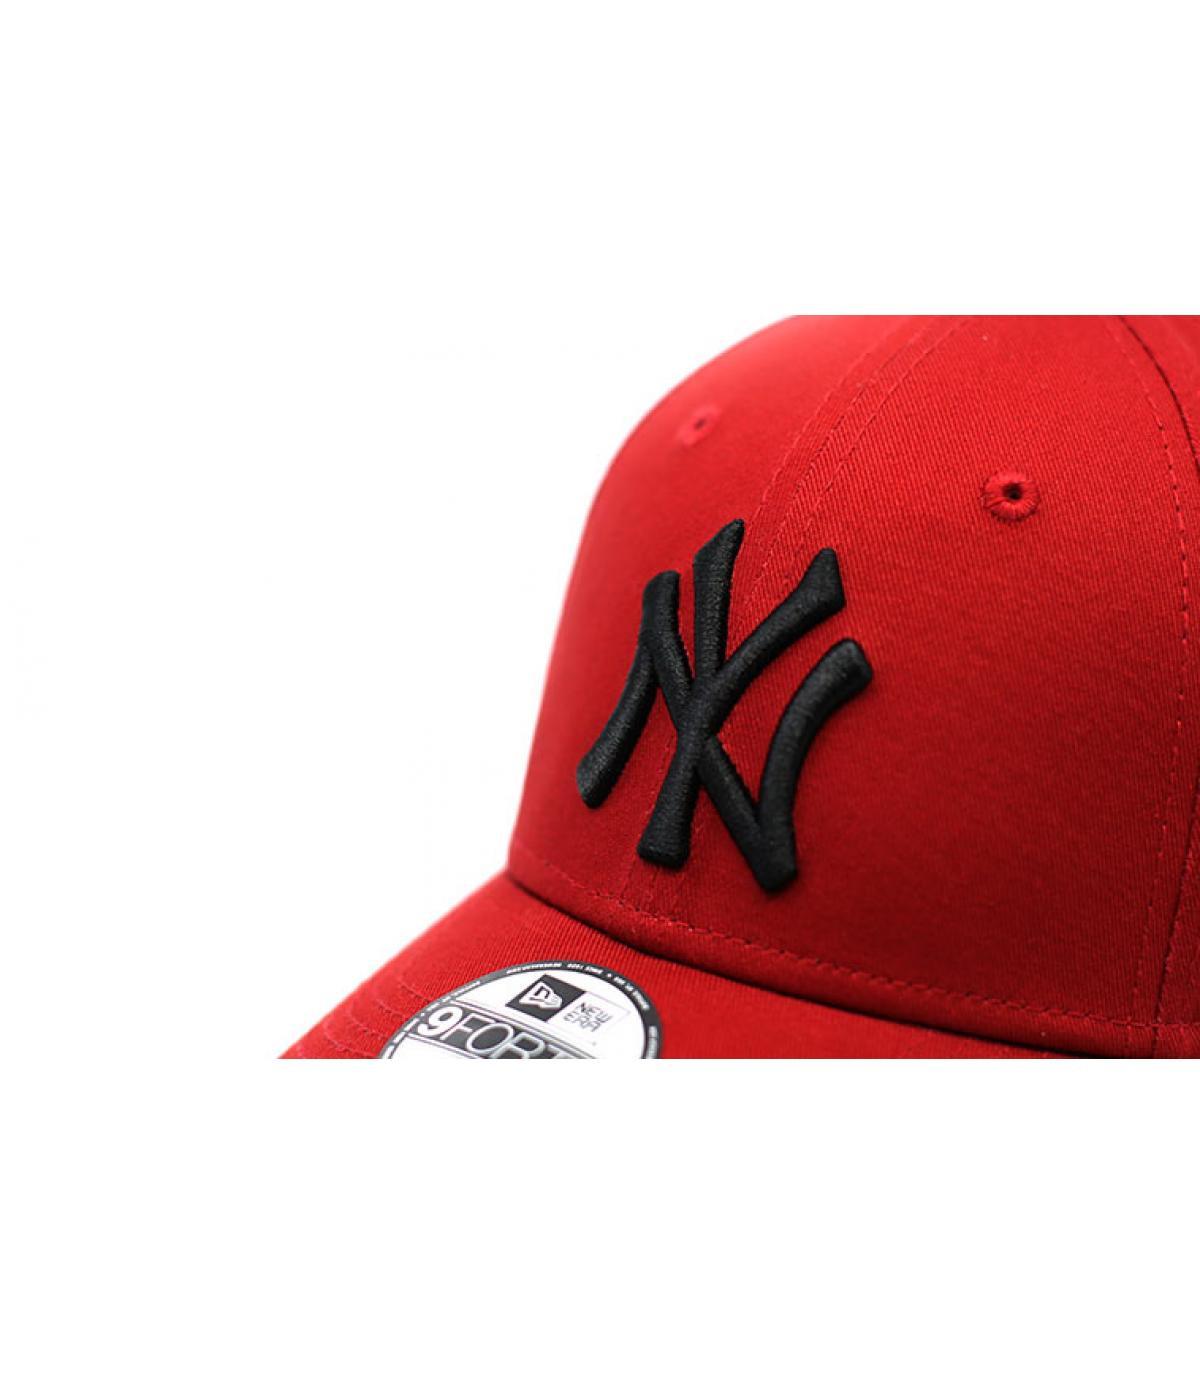 Détails League Ess NY 9Forty hot red black - image 3